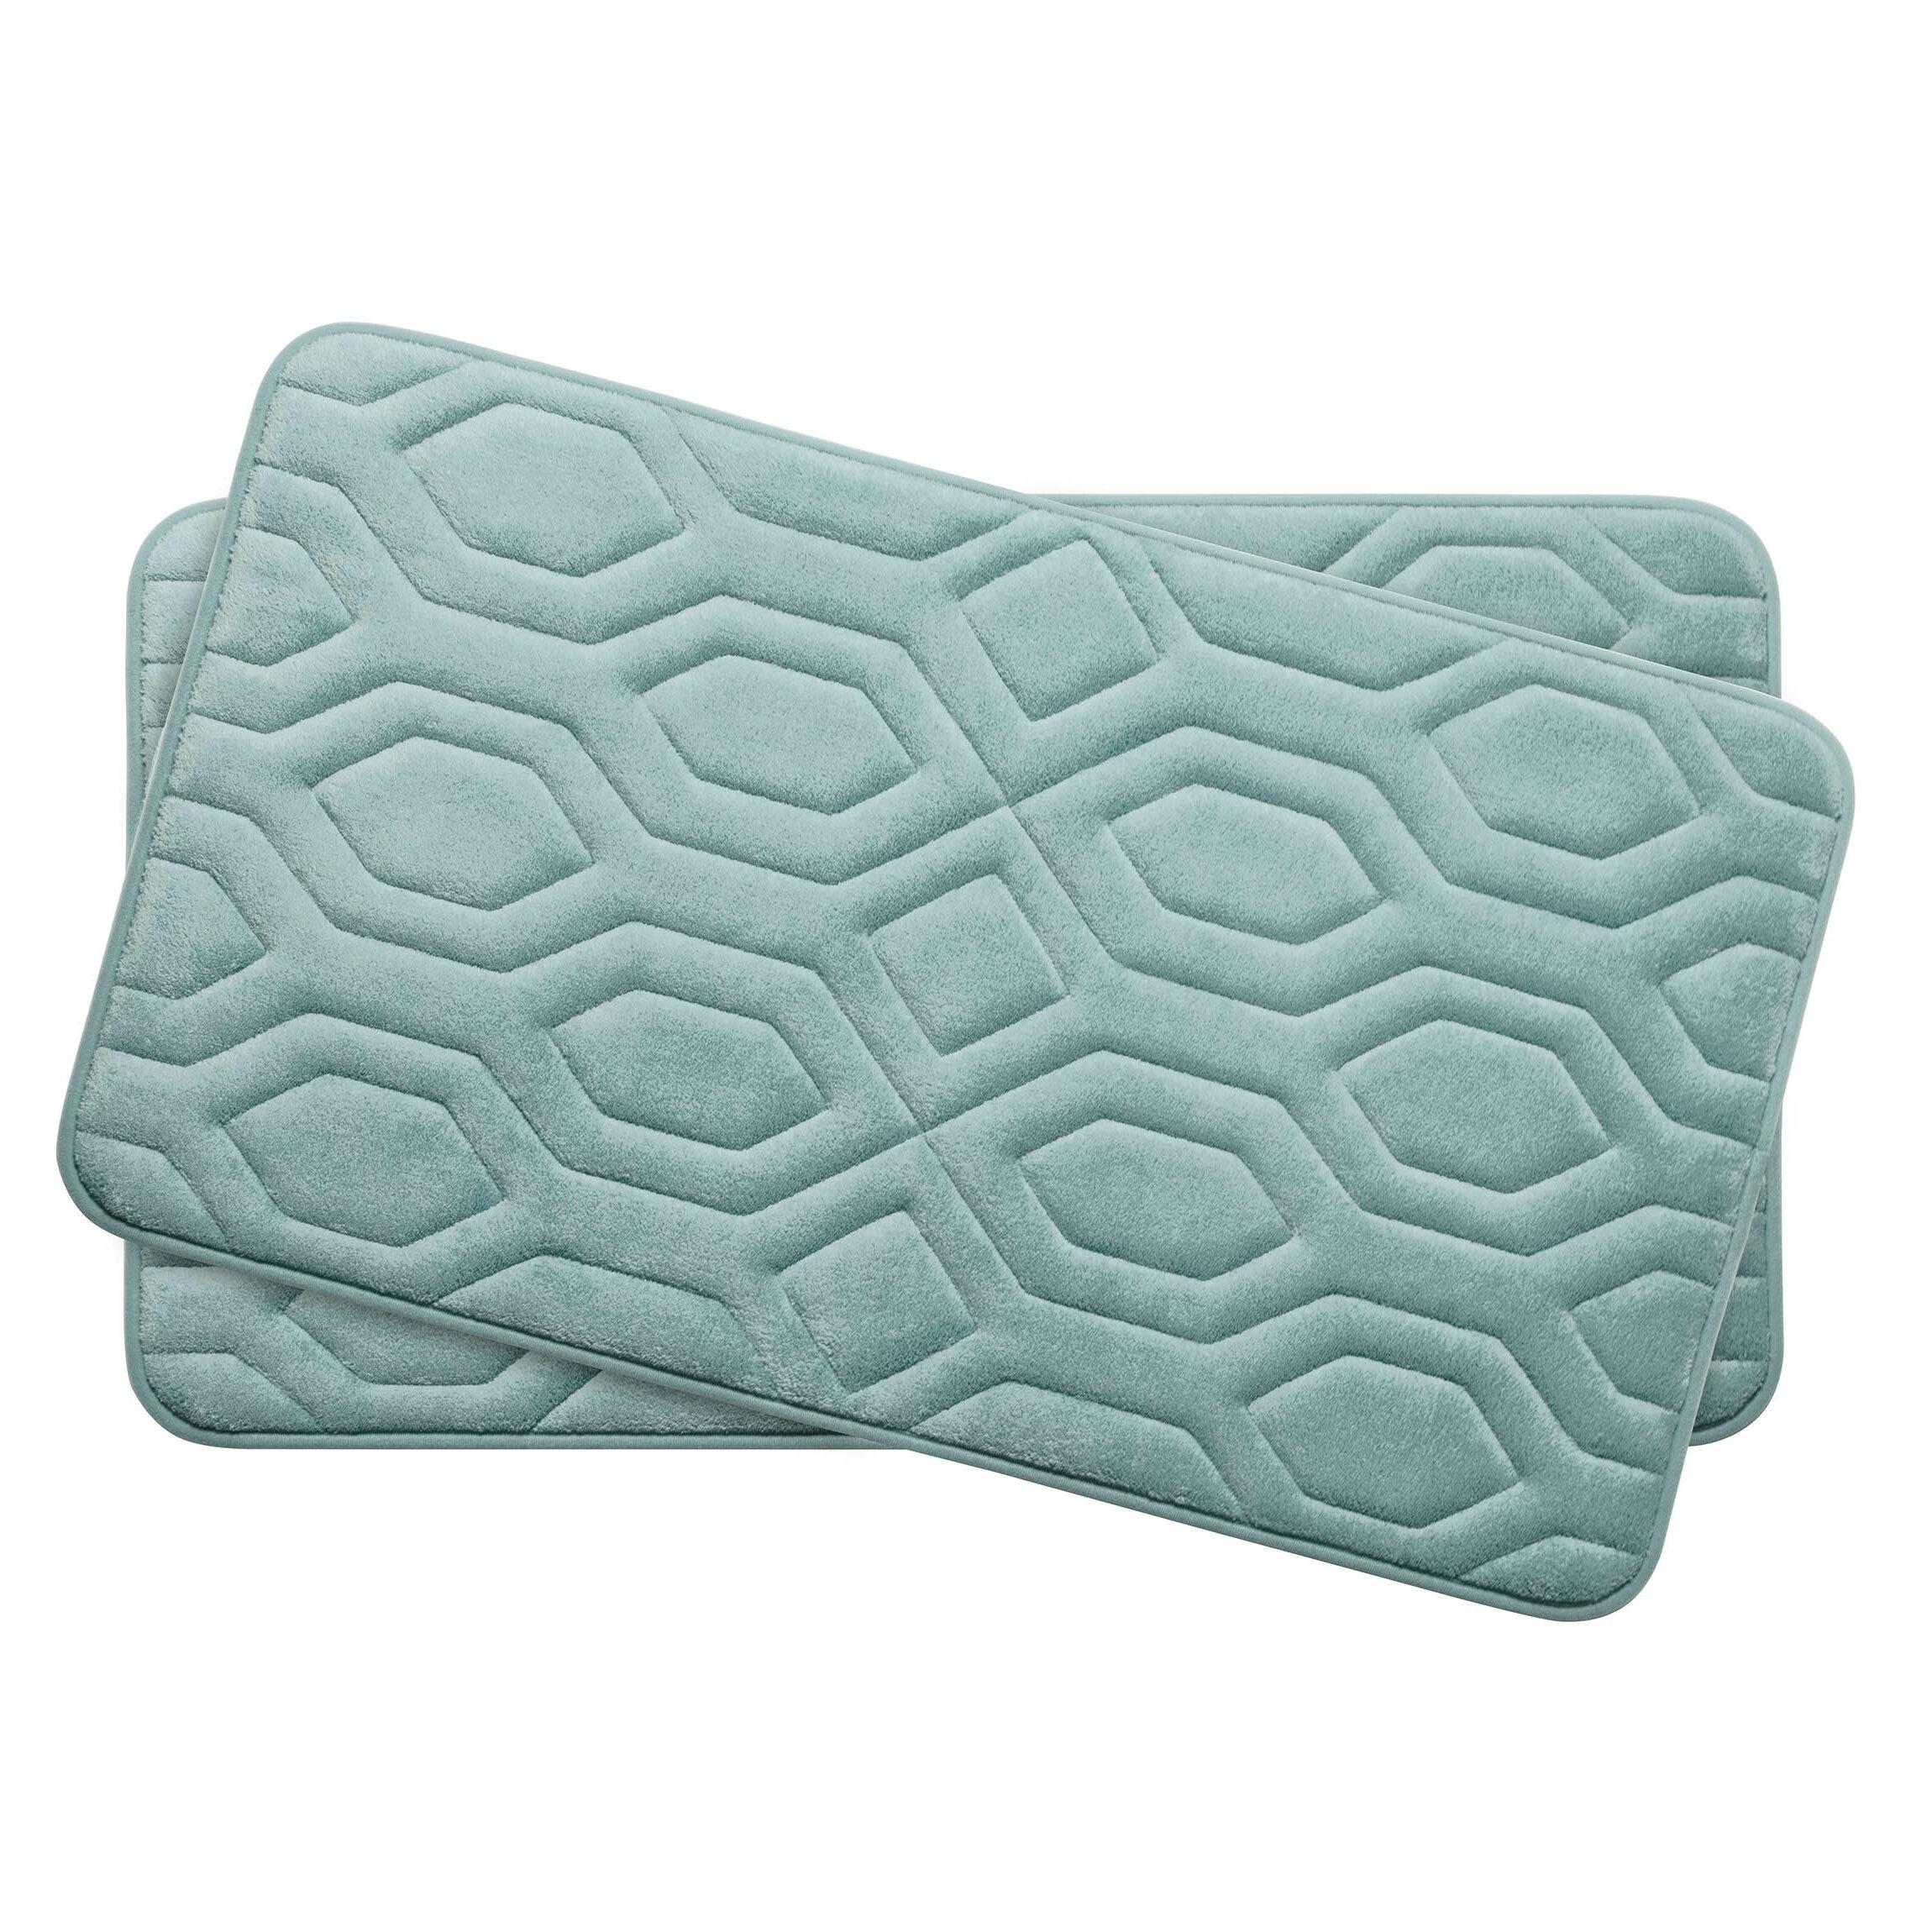 Memory Foam Non Slip 2 Piece Bath Rug